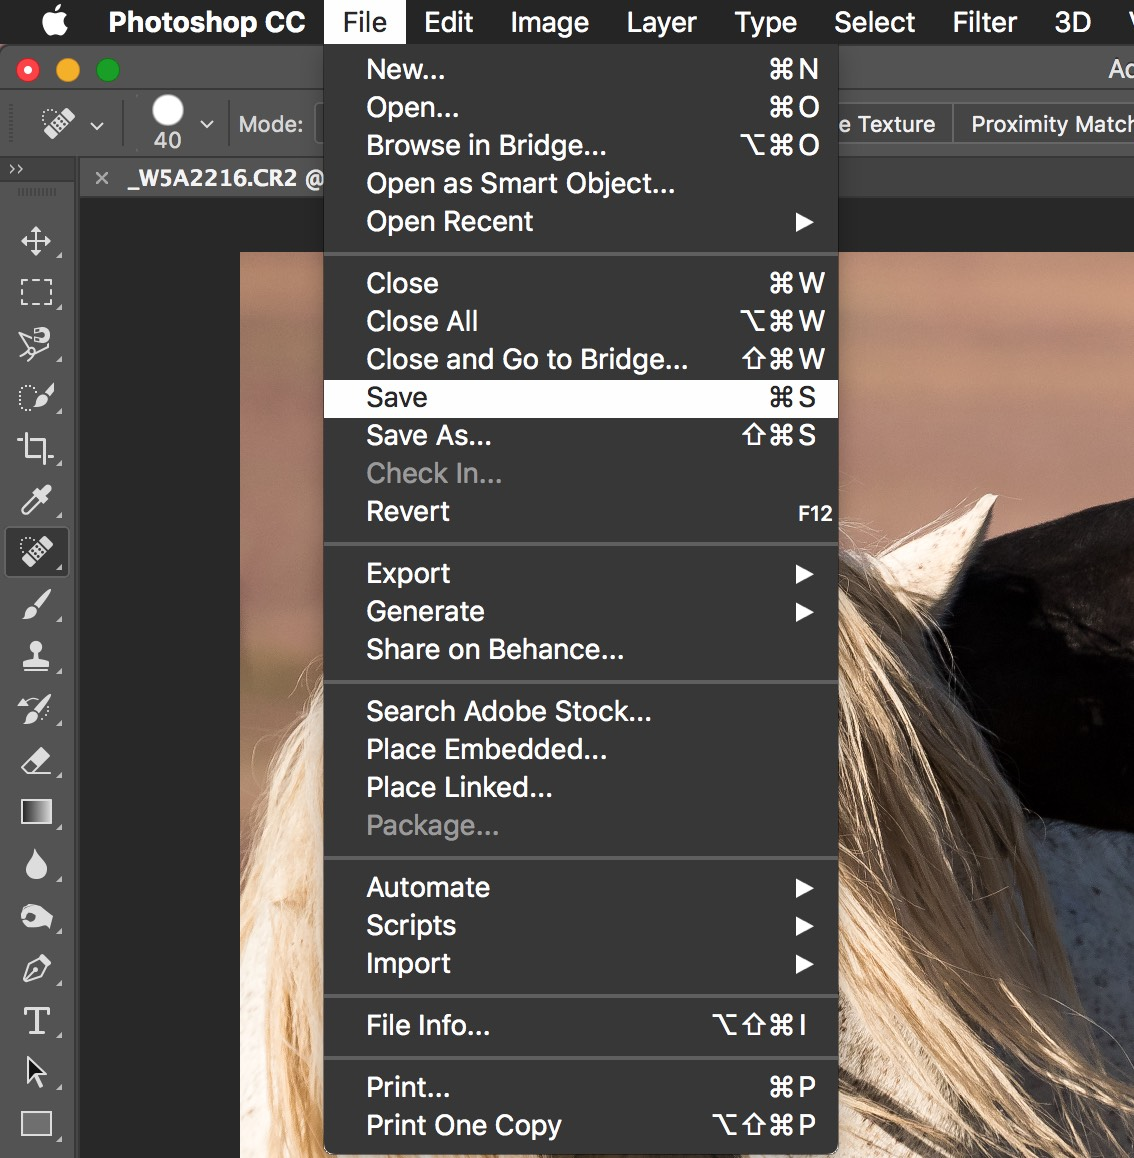 Photoshop Spot Healing Brush Tool - save